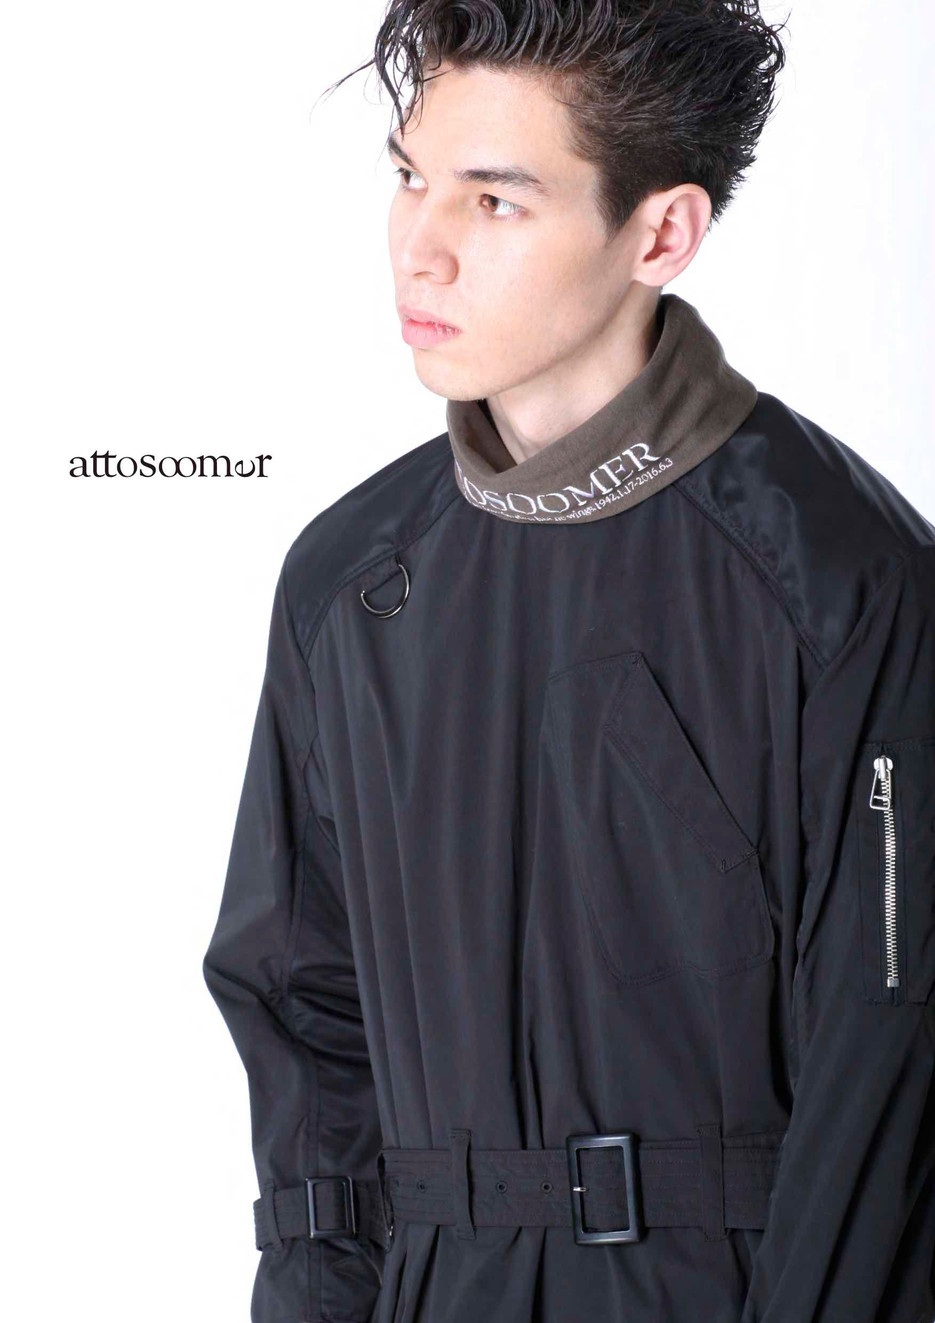 attosoomer1